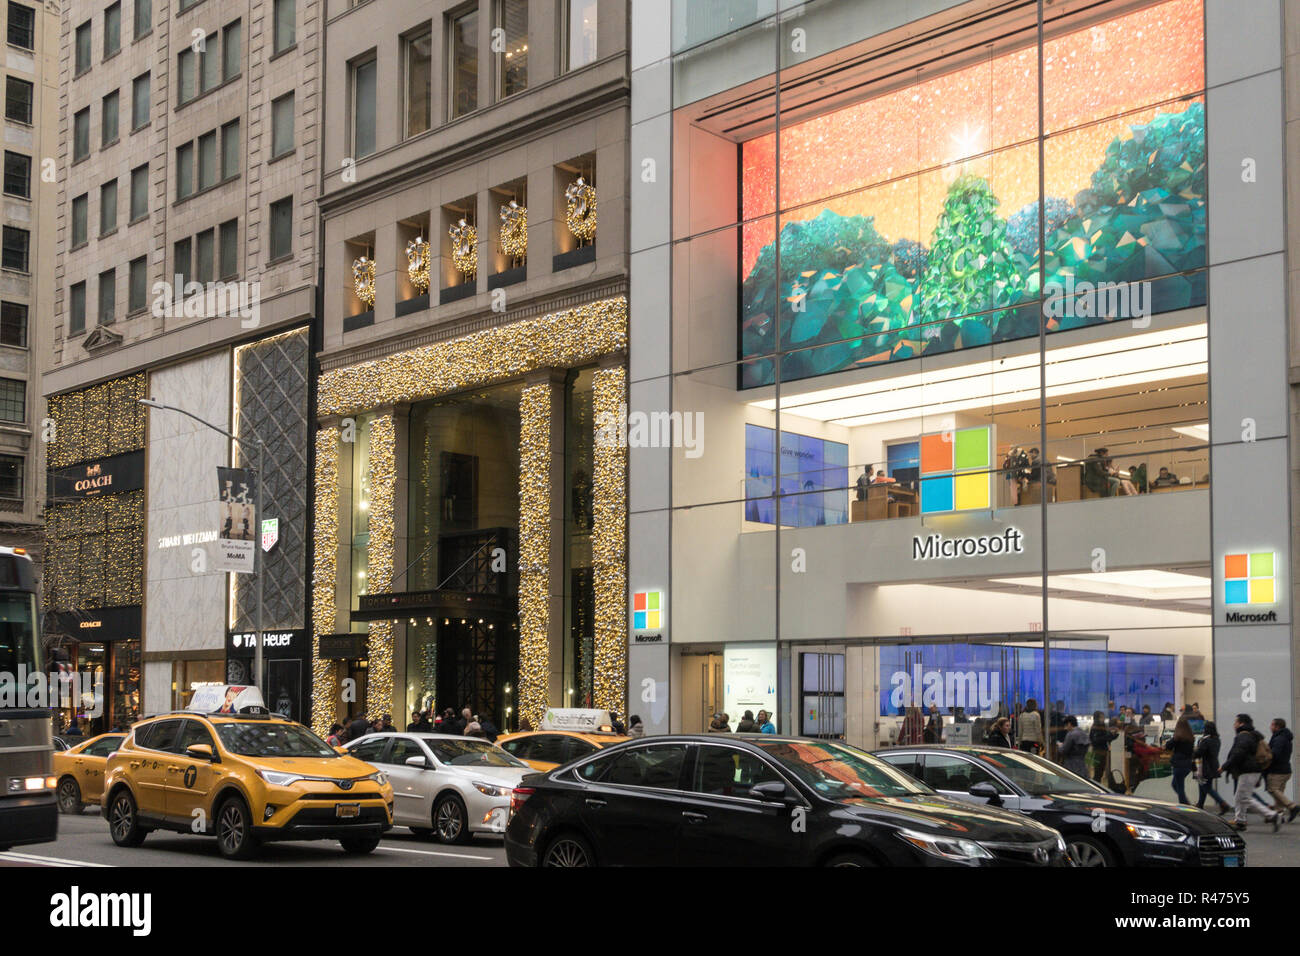 Fifth Avenue during holiday season, Midtown Manhattan, NYC, USA Stock Photo